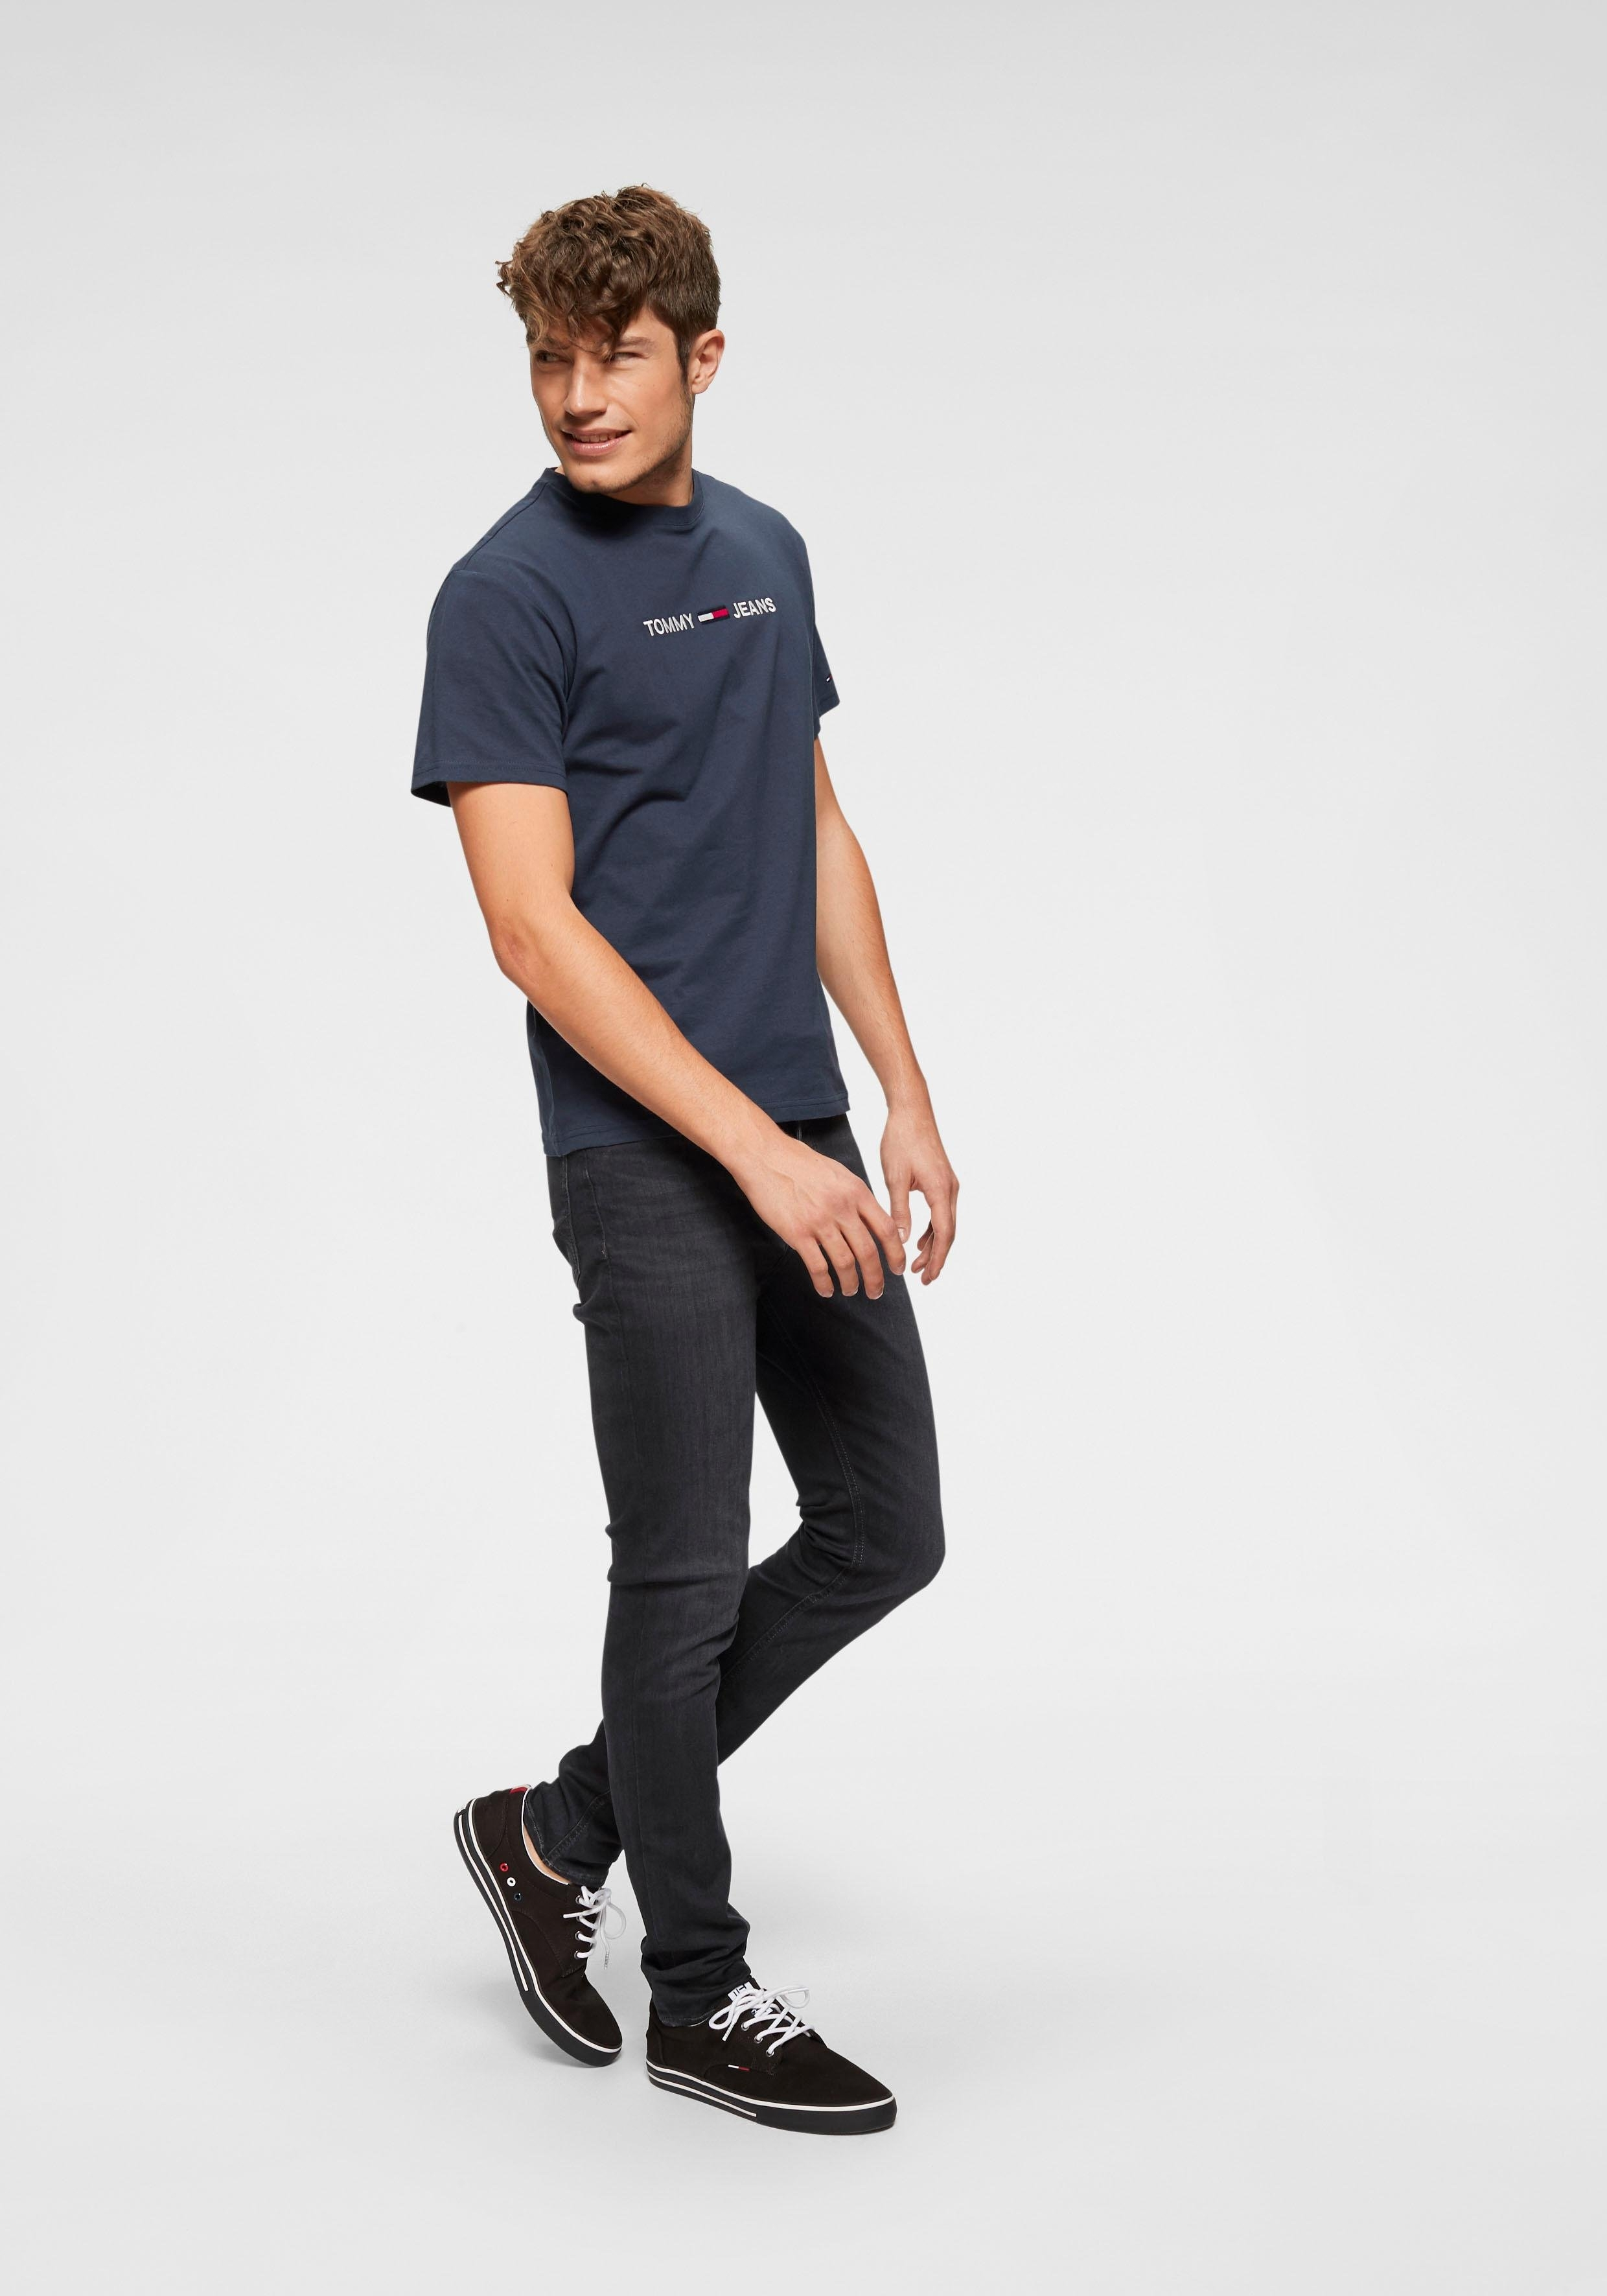 Besteld Met Tee Makkelijk Small Shirt Tommy Jeans Text Printtjm hdQrxtCs